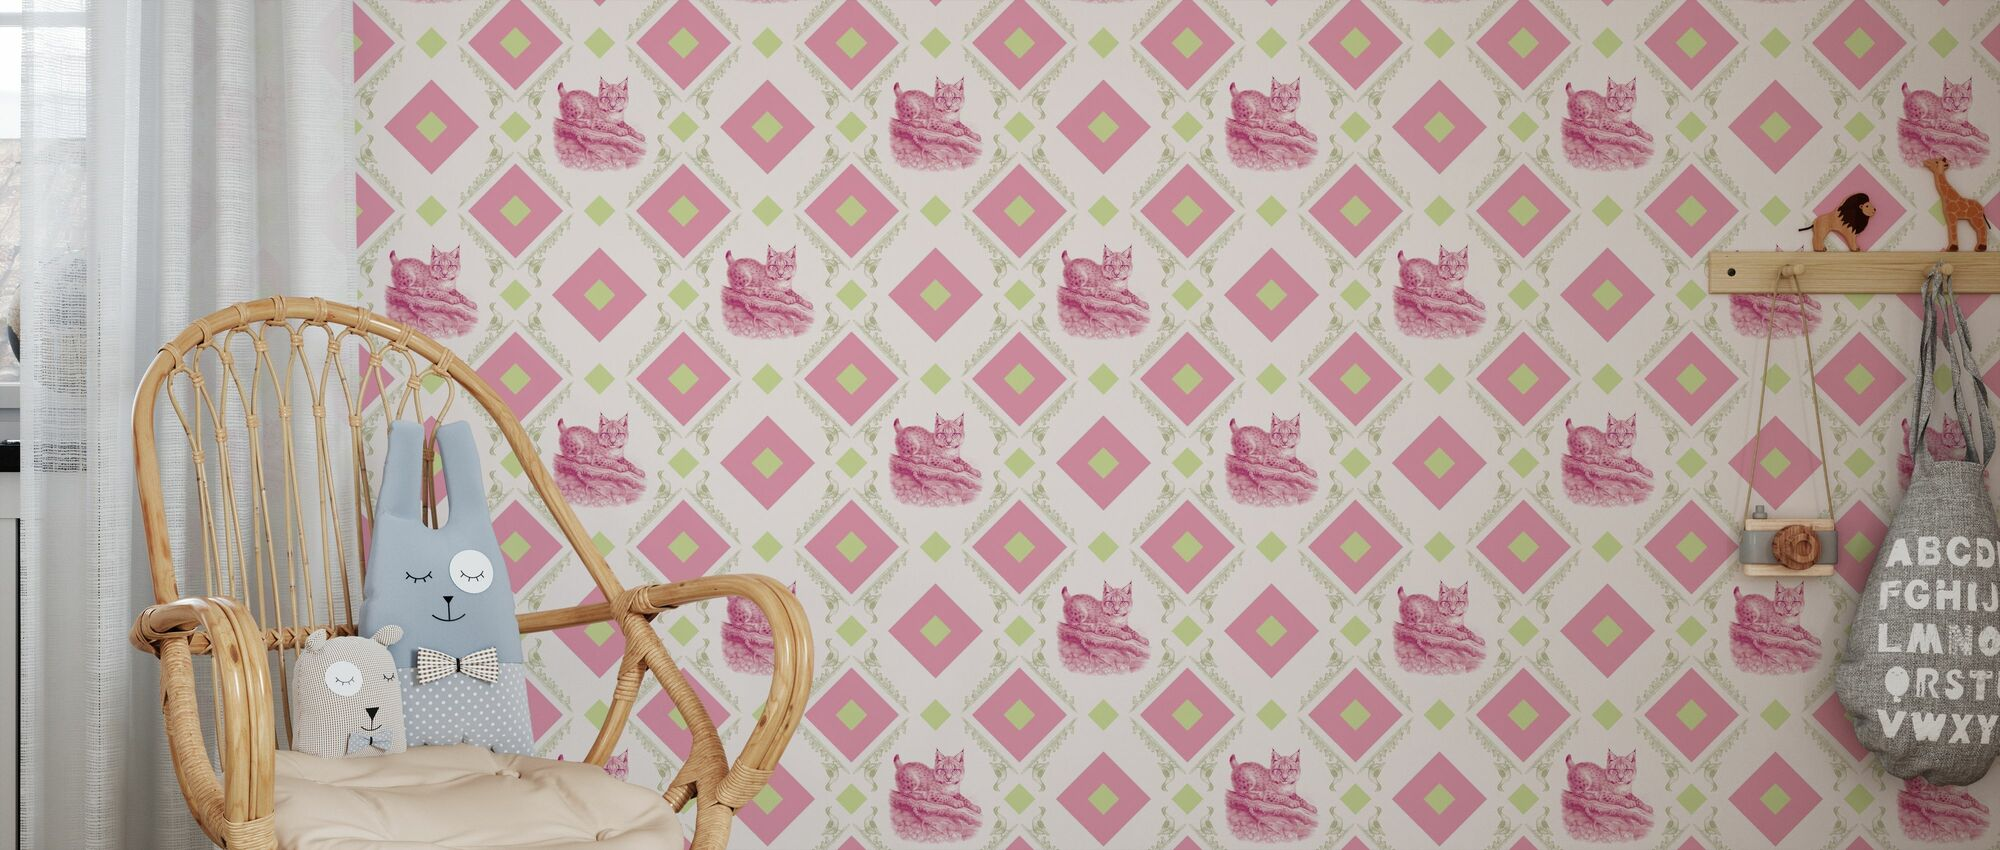 Young Lynx - Gooseframe - Pink Green - Wallpaper - Kids Room